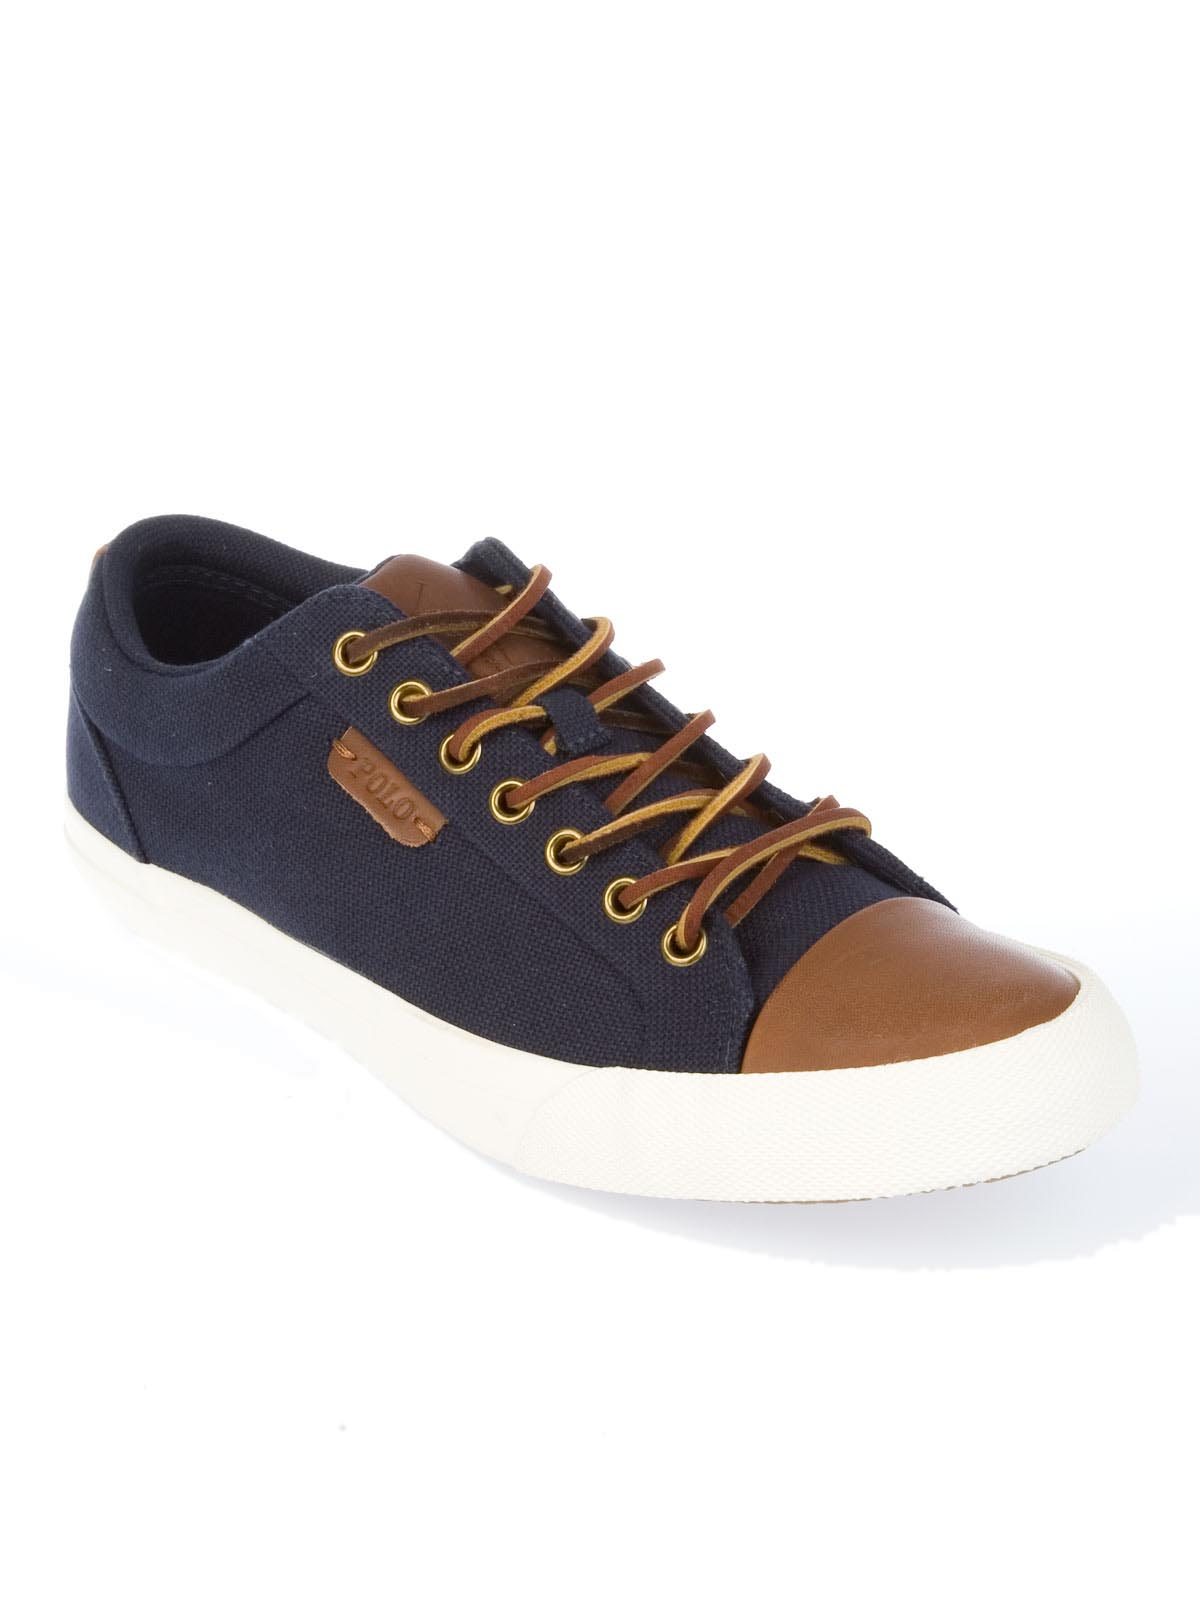 polo ralph lauren geffrey sneaker newport navy a85y0462bdmpq botta b online store. Black Bedroom Furniture Sets. Home Design Ideas